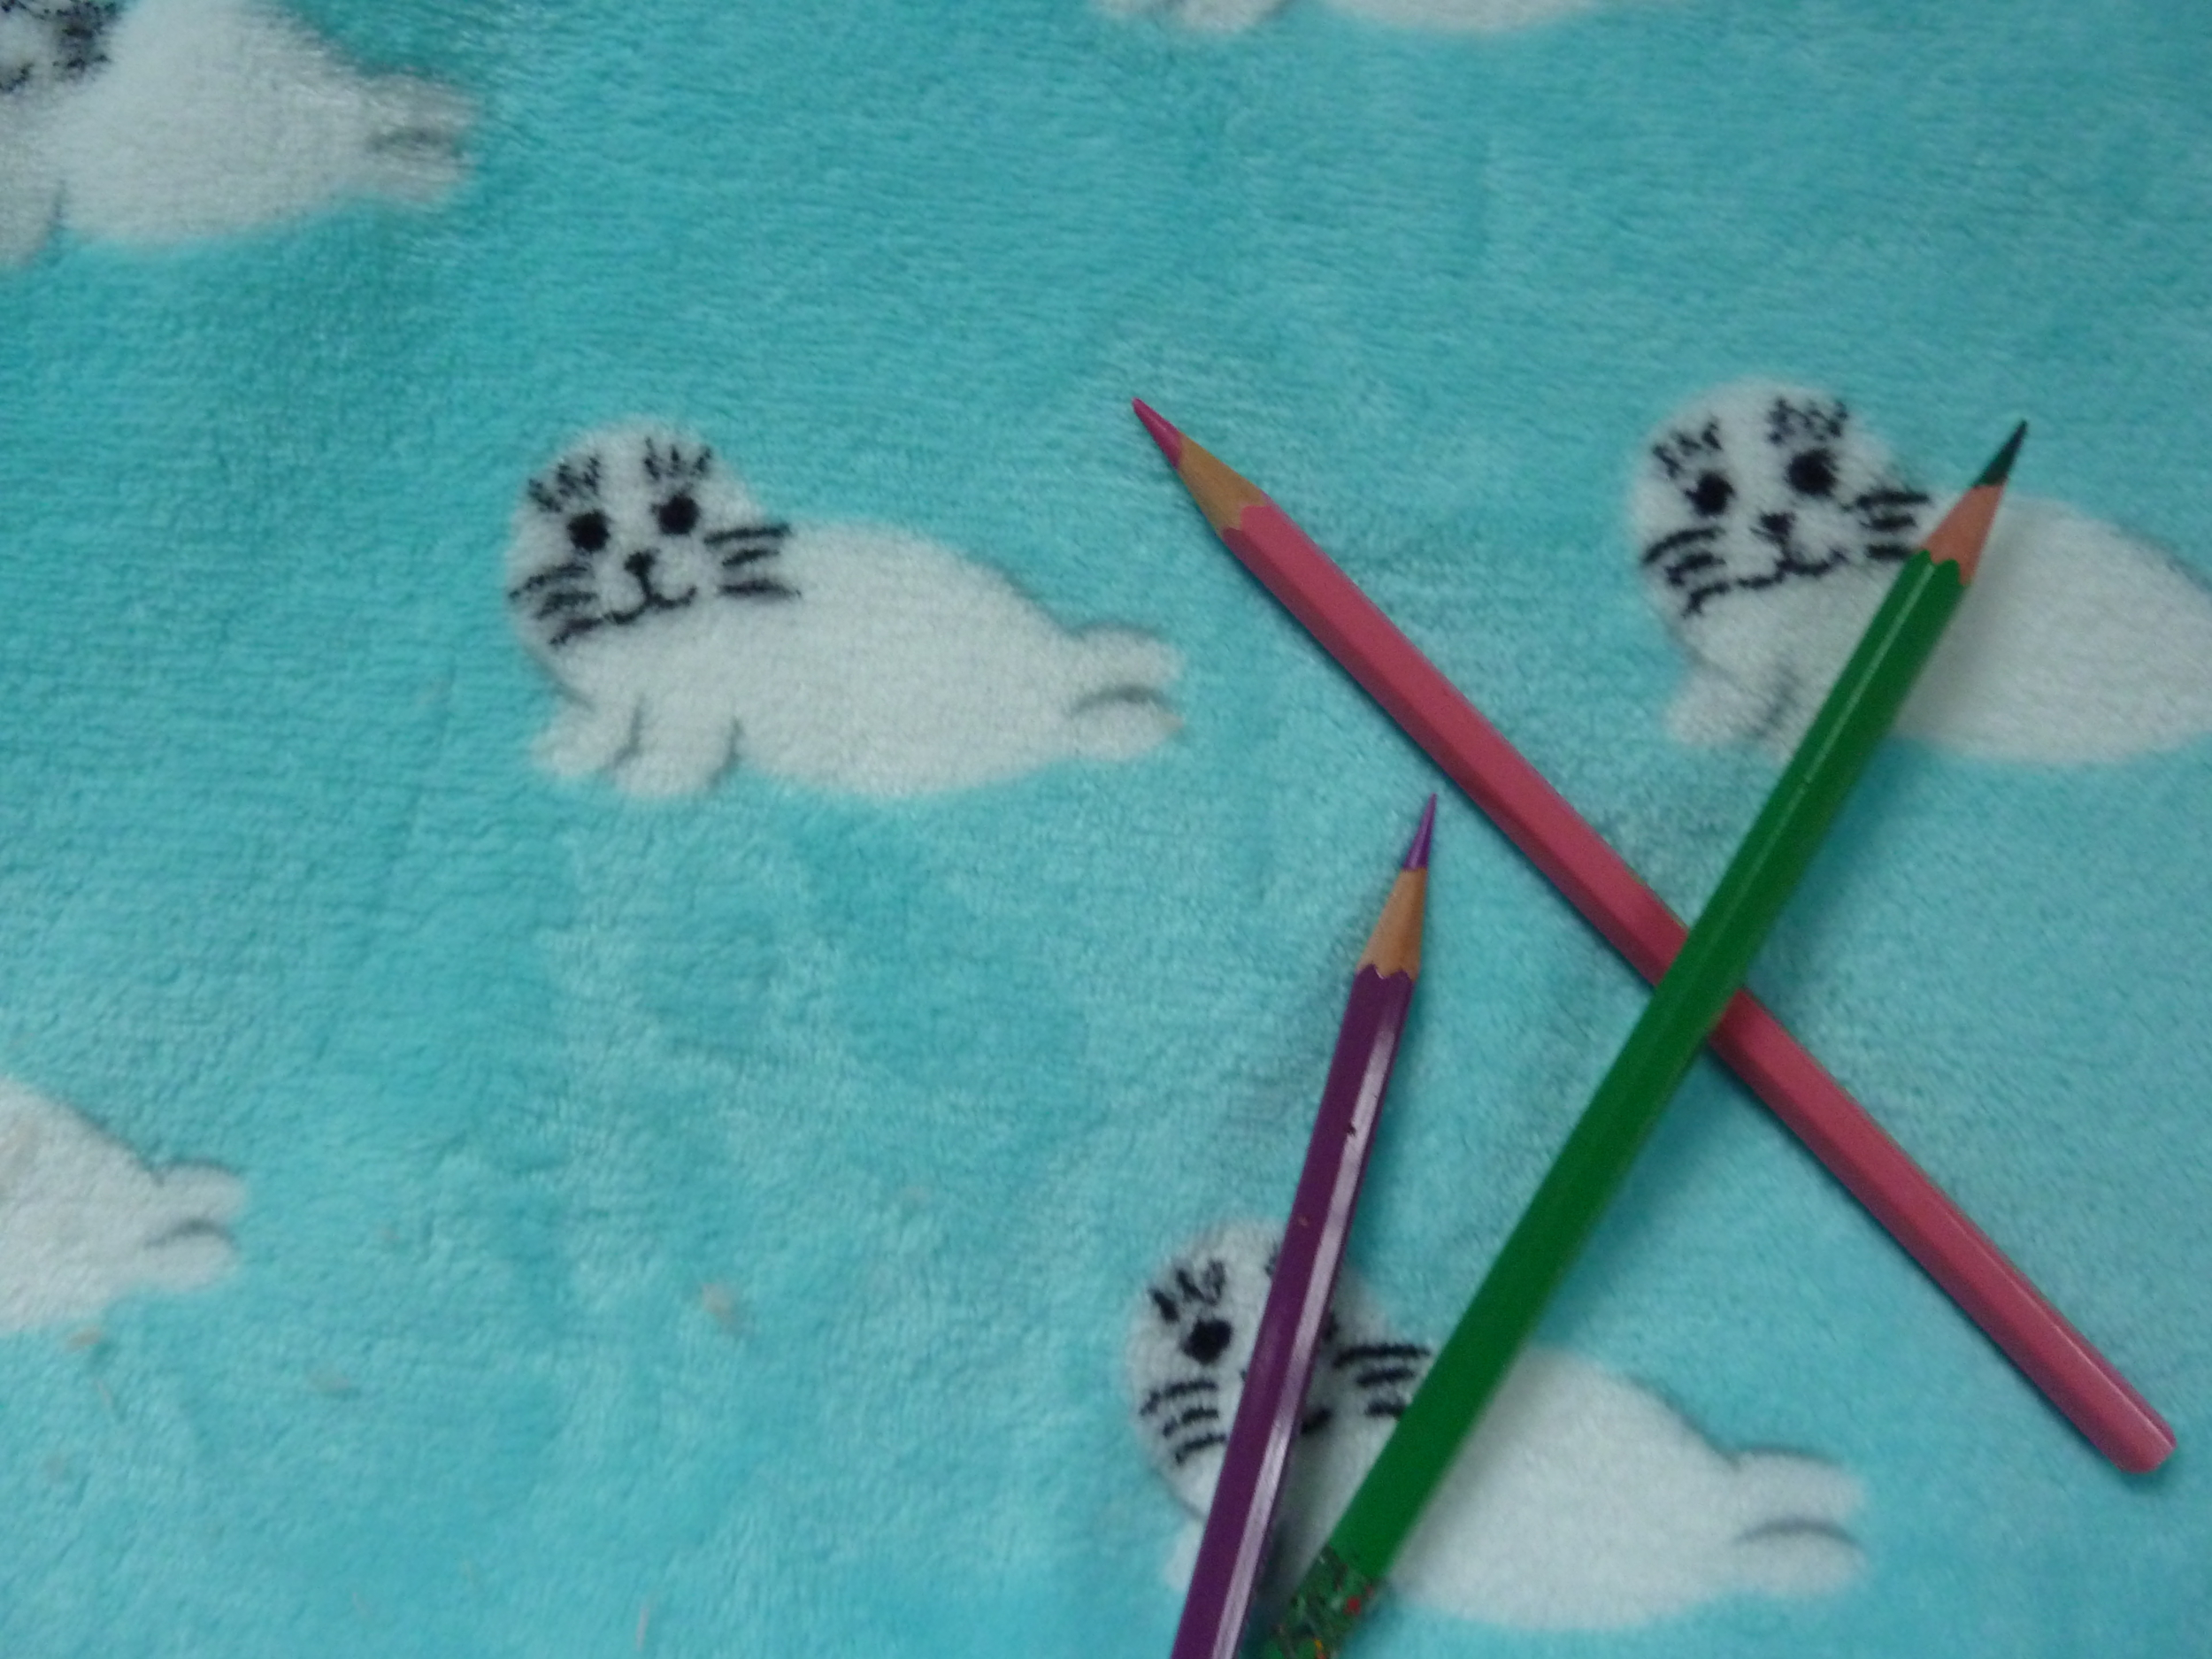 Traversin calin -Tour de lit - Fleece petits phoques